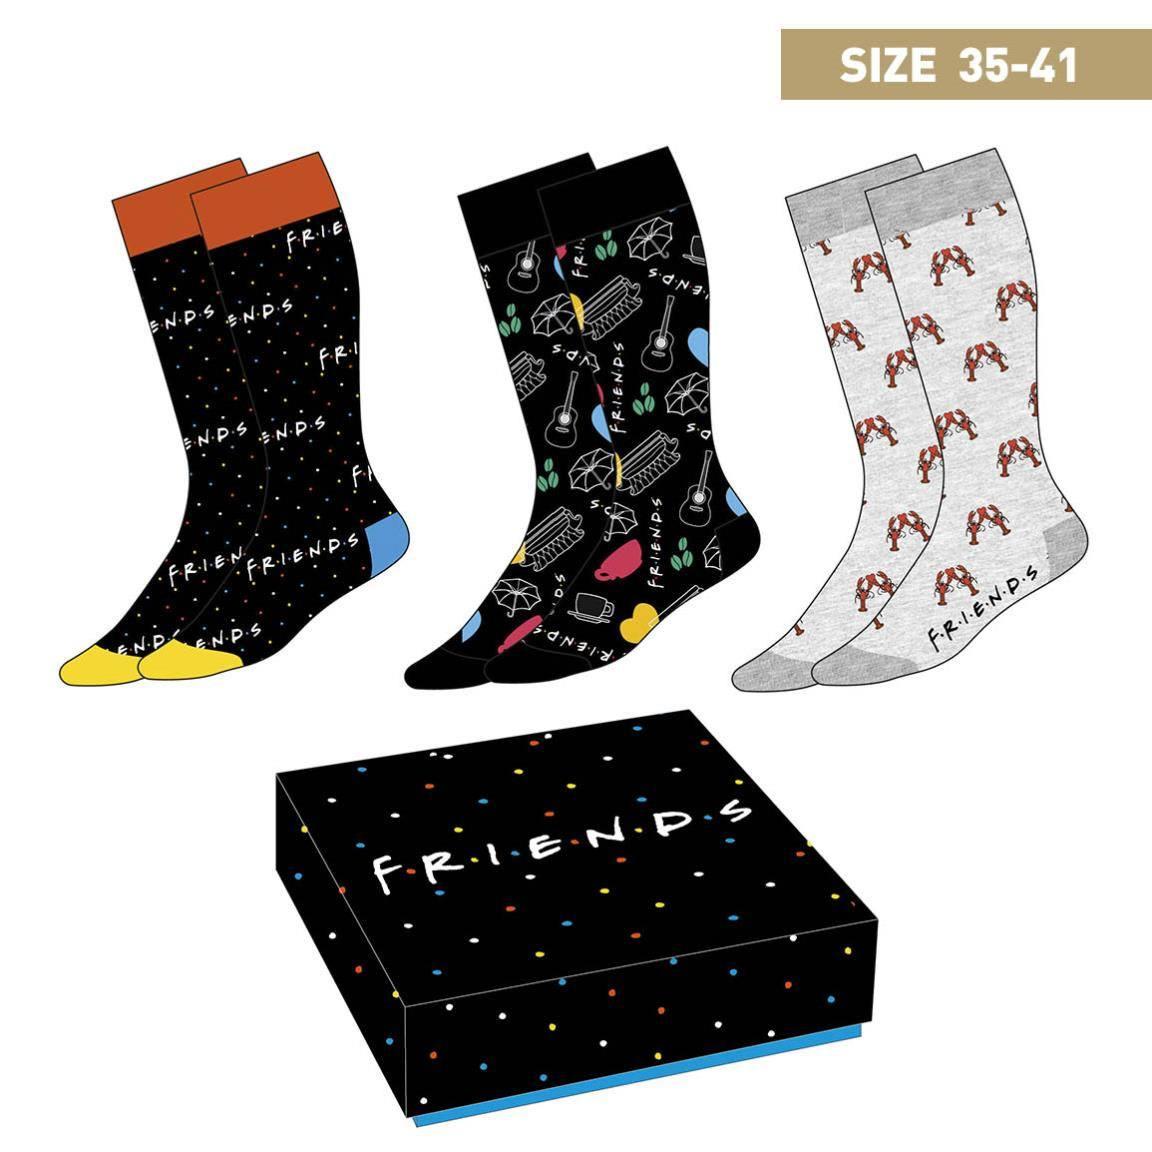 Friends Socks 3-Pack Symbols 35-41